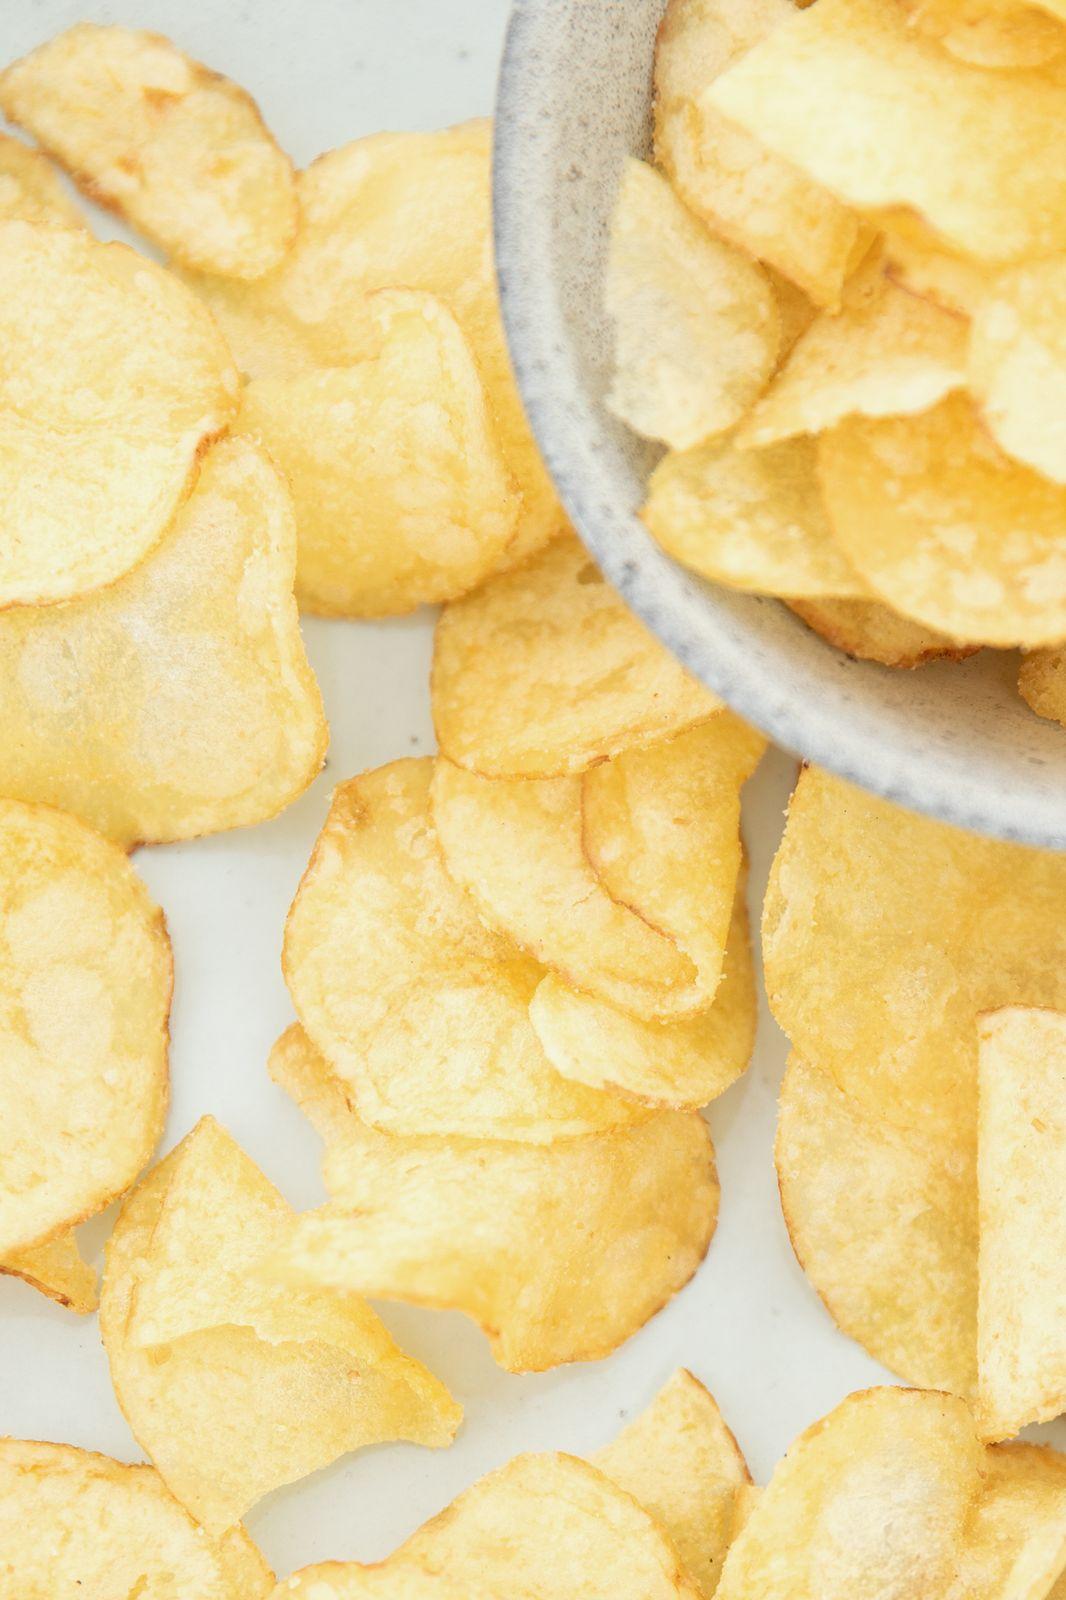 Sale marino seasalt glutenvrij chips - Homeland | Sissy-Boy